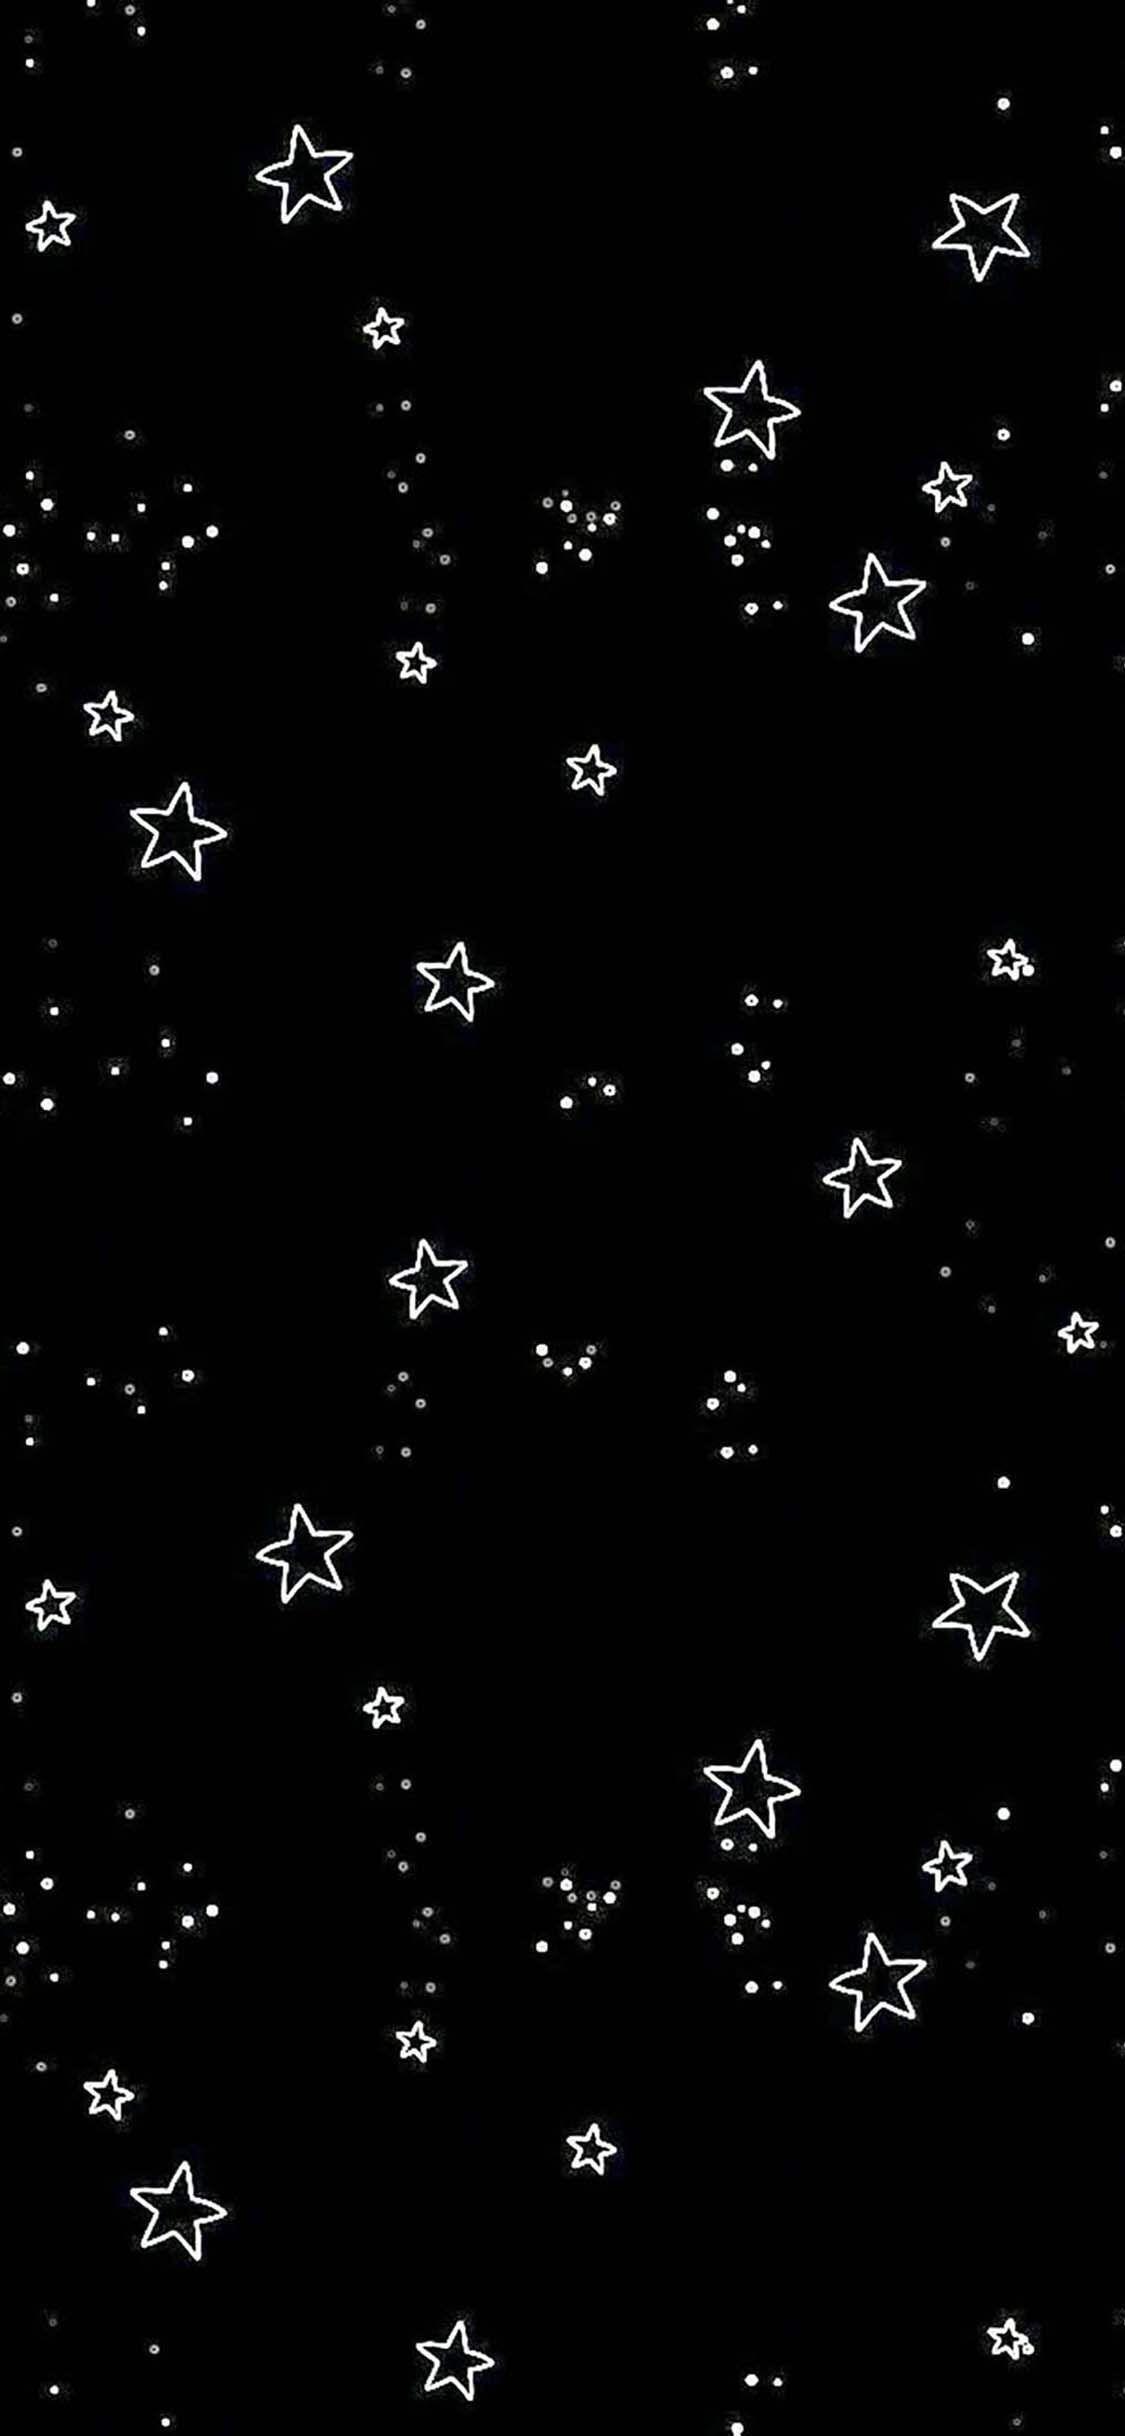 Download Most Downloaded Black Wallpaper For Smartphones 2019 Star Wallpaper Black Phone Wallpaper Black Background Wallpaper